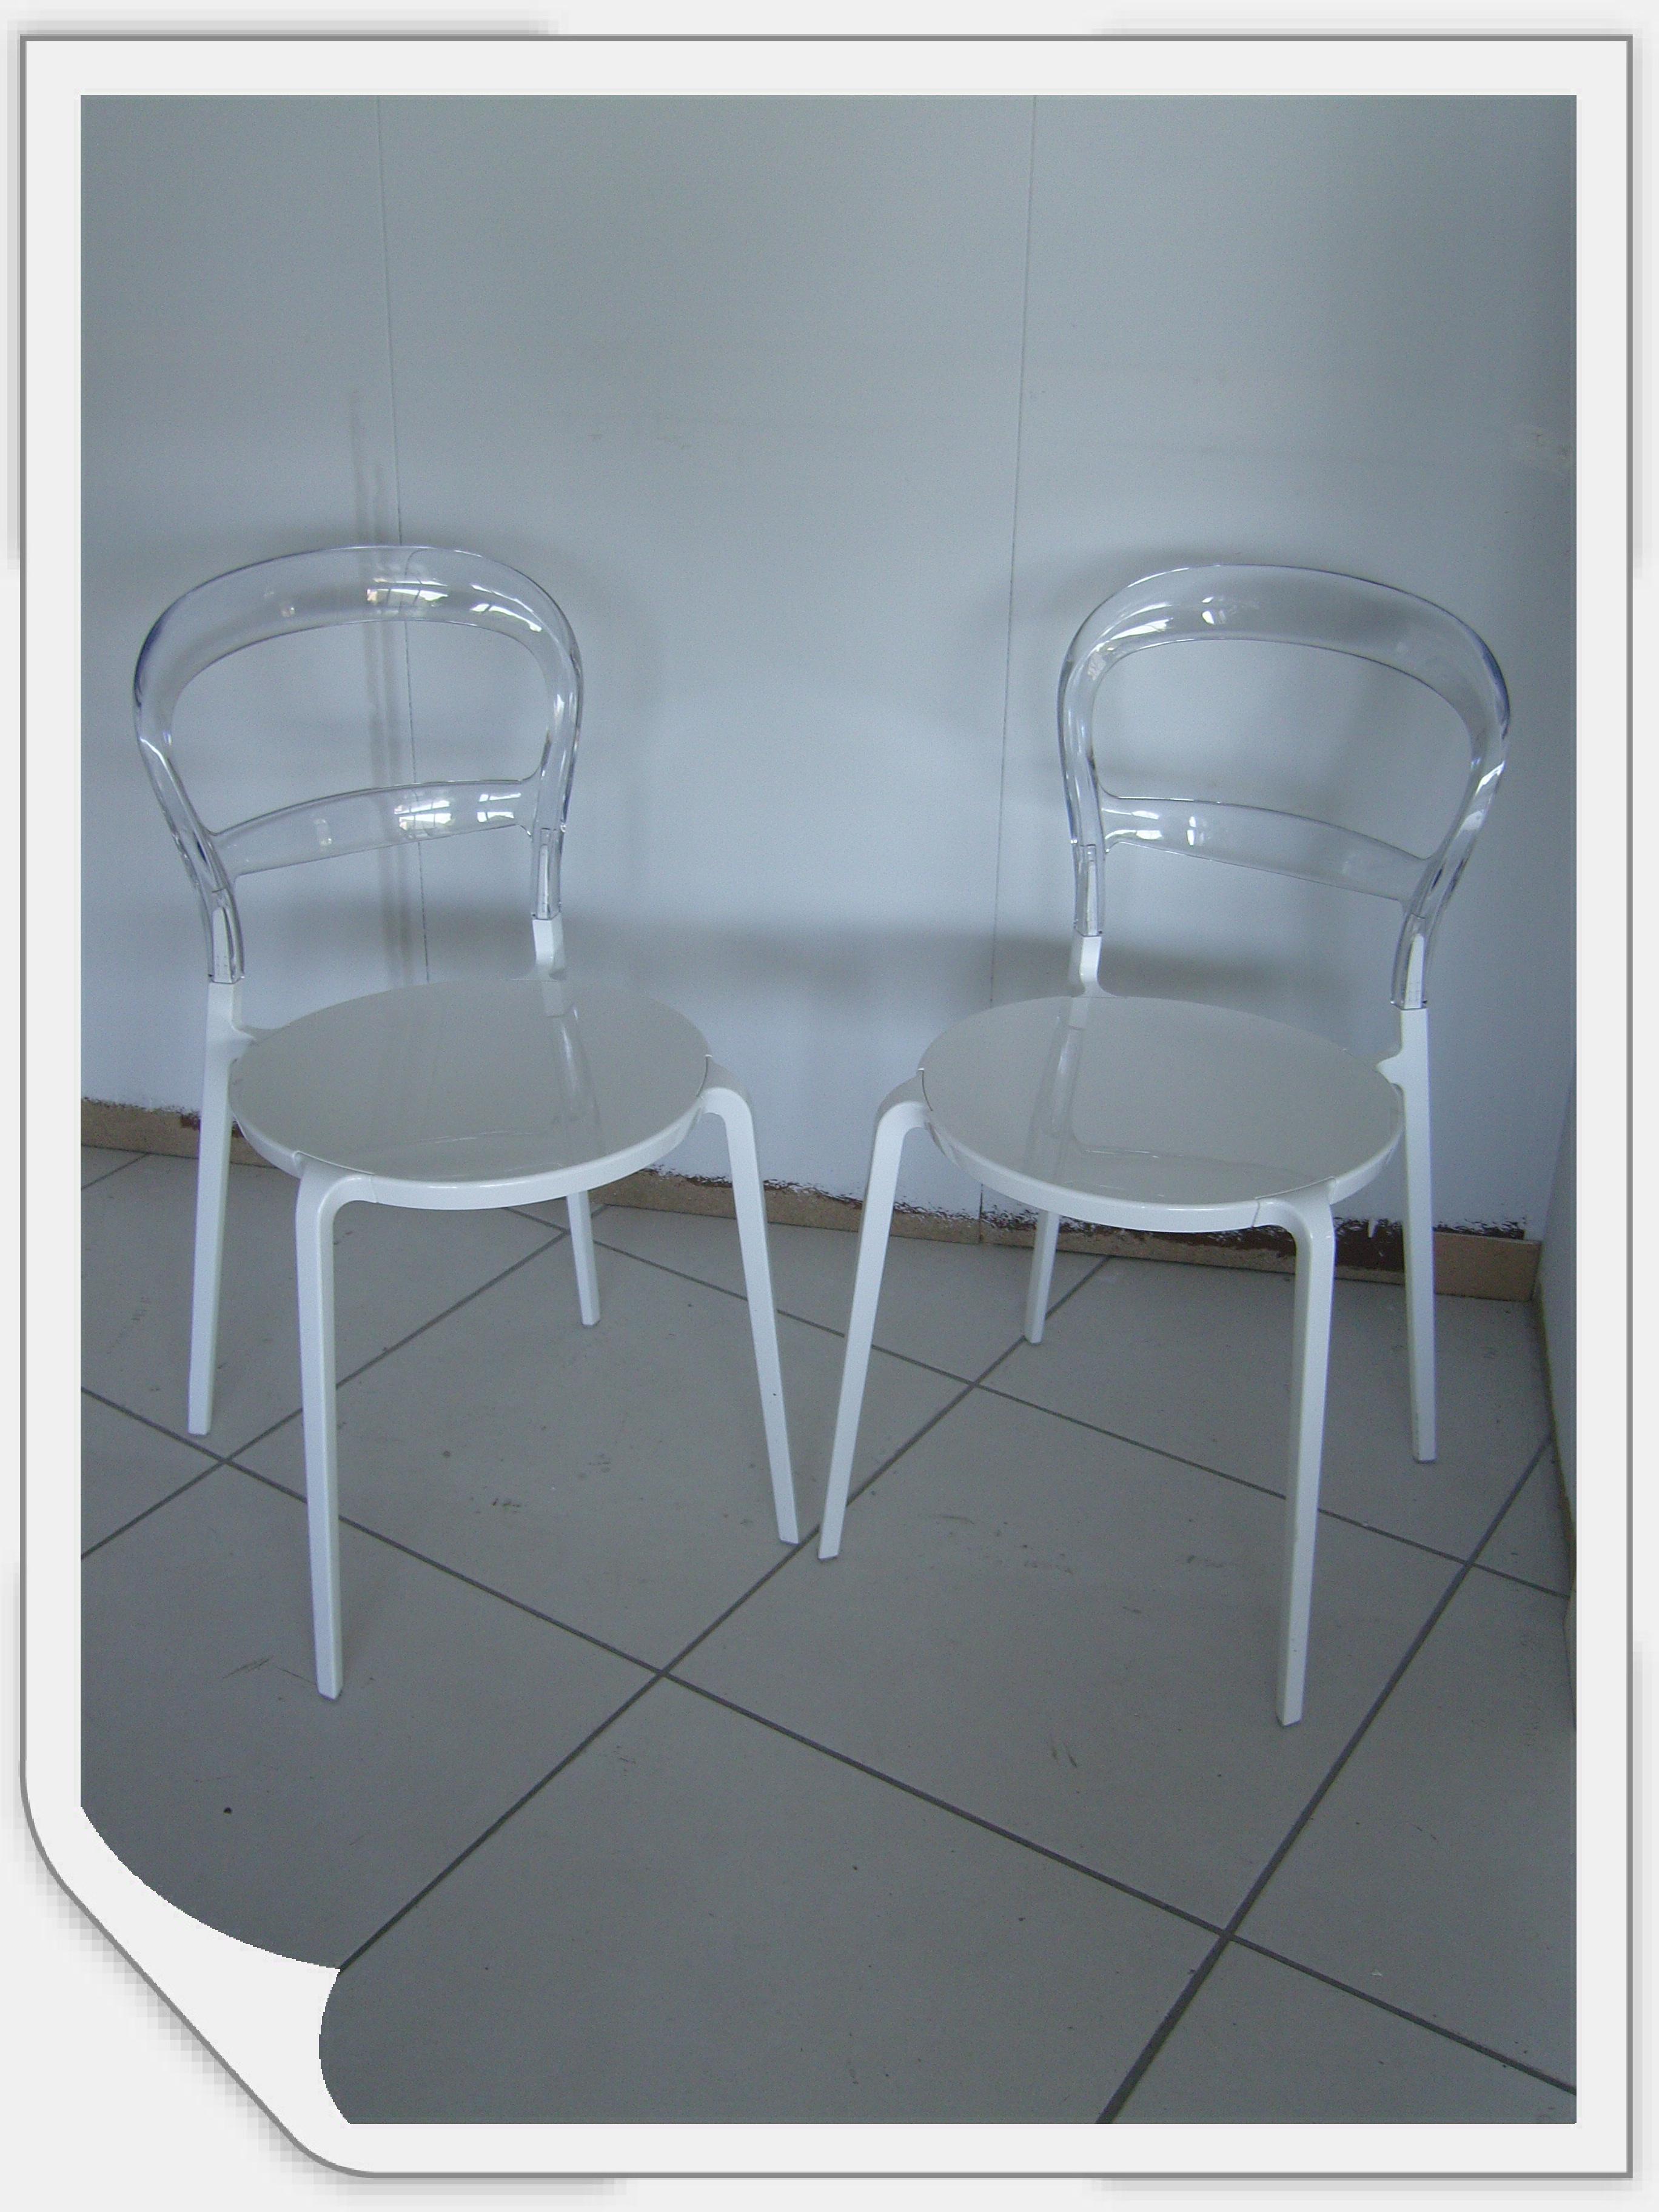 Calligaris sedia wien sedie scontato del 61 sedie a for Sedie e tavoli calligaris prezzi